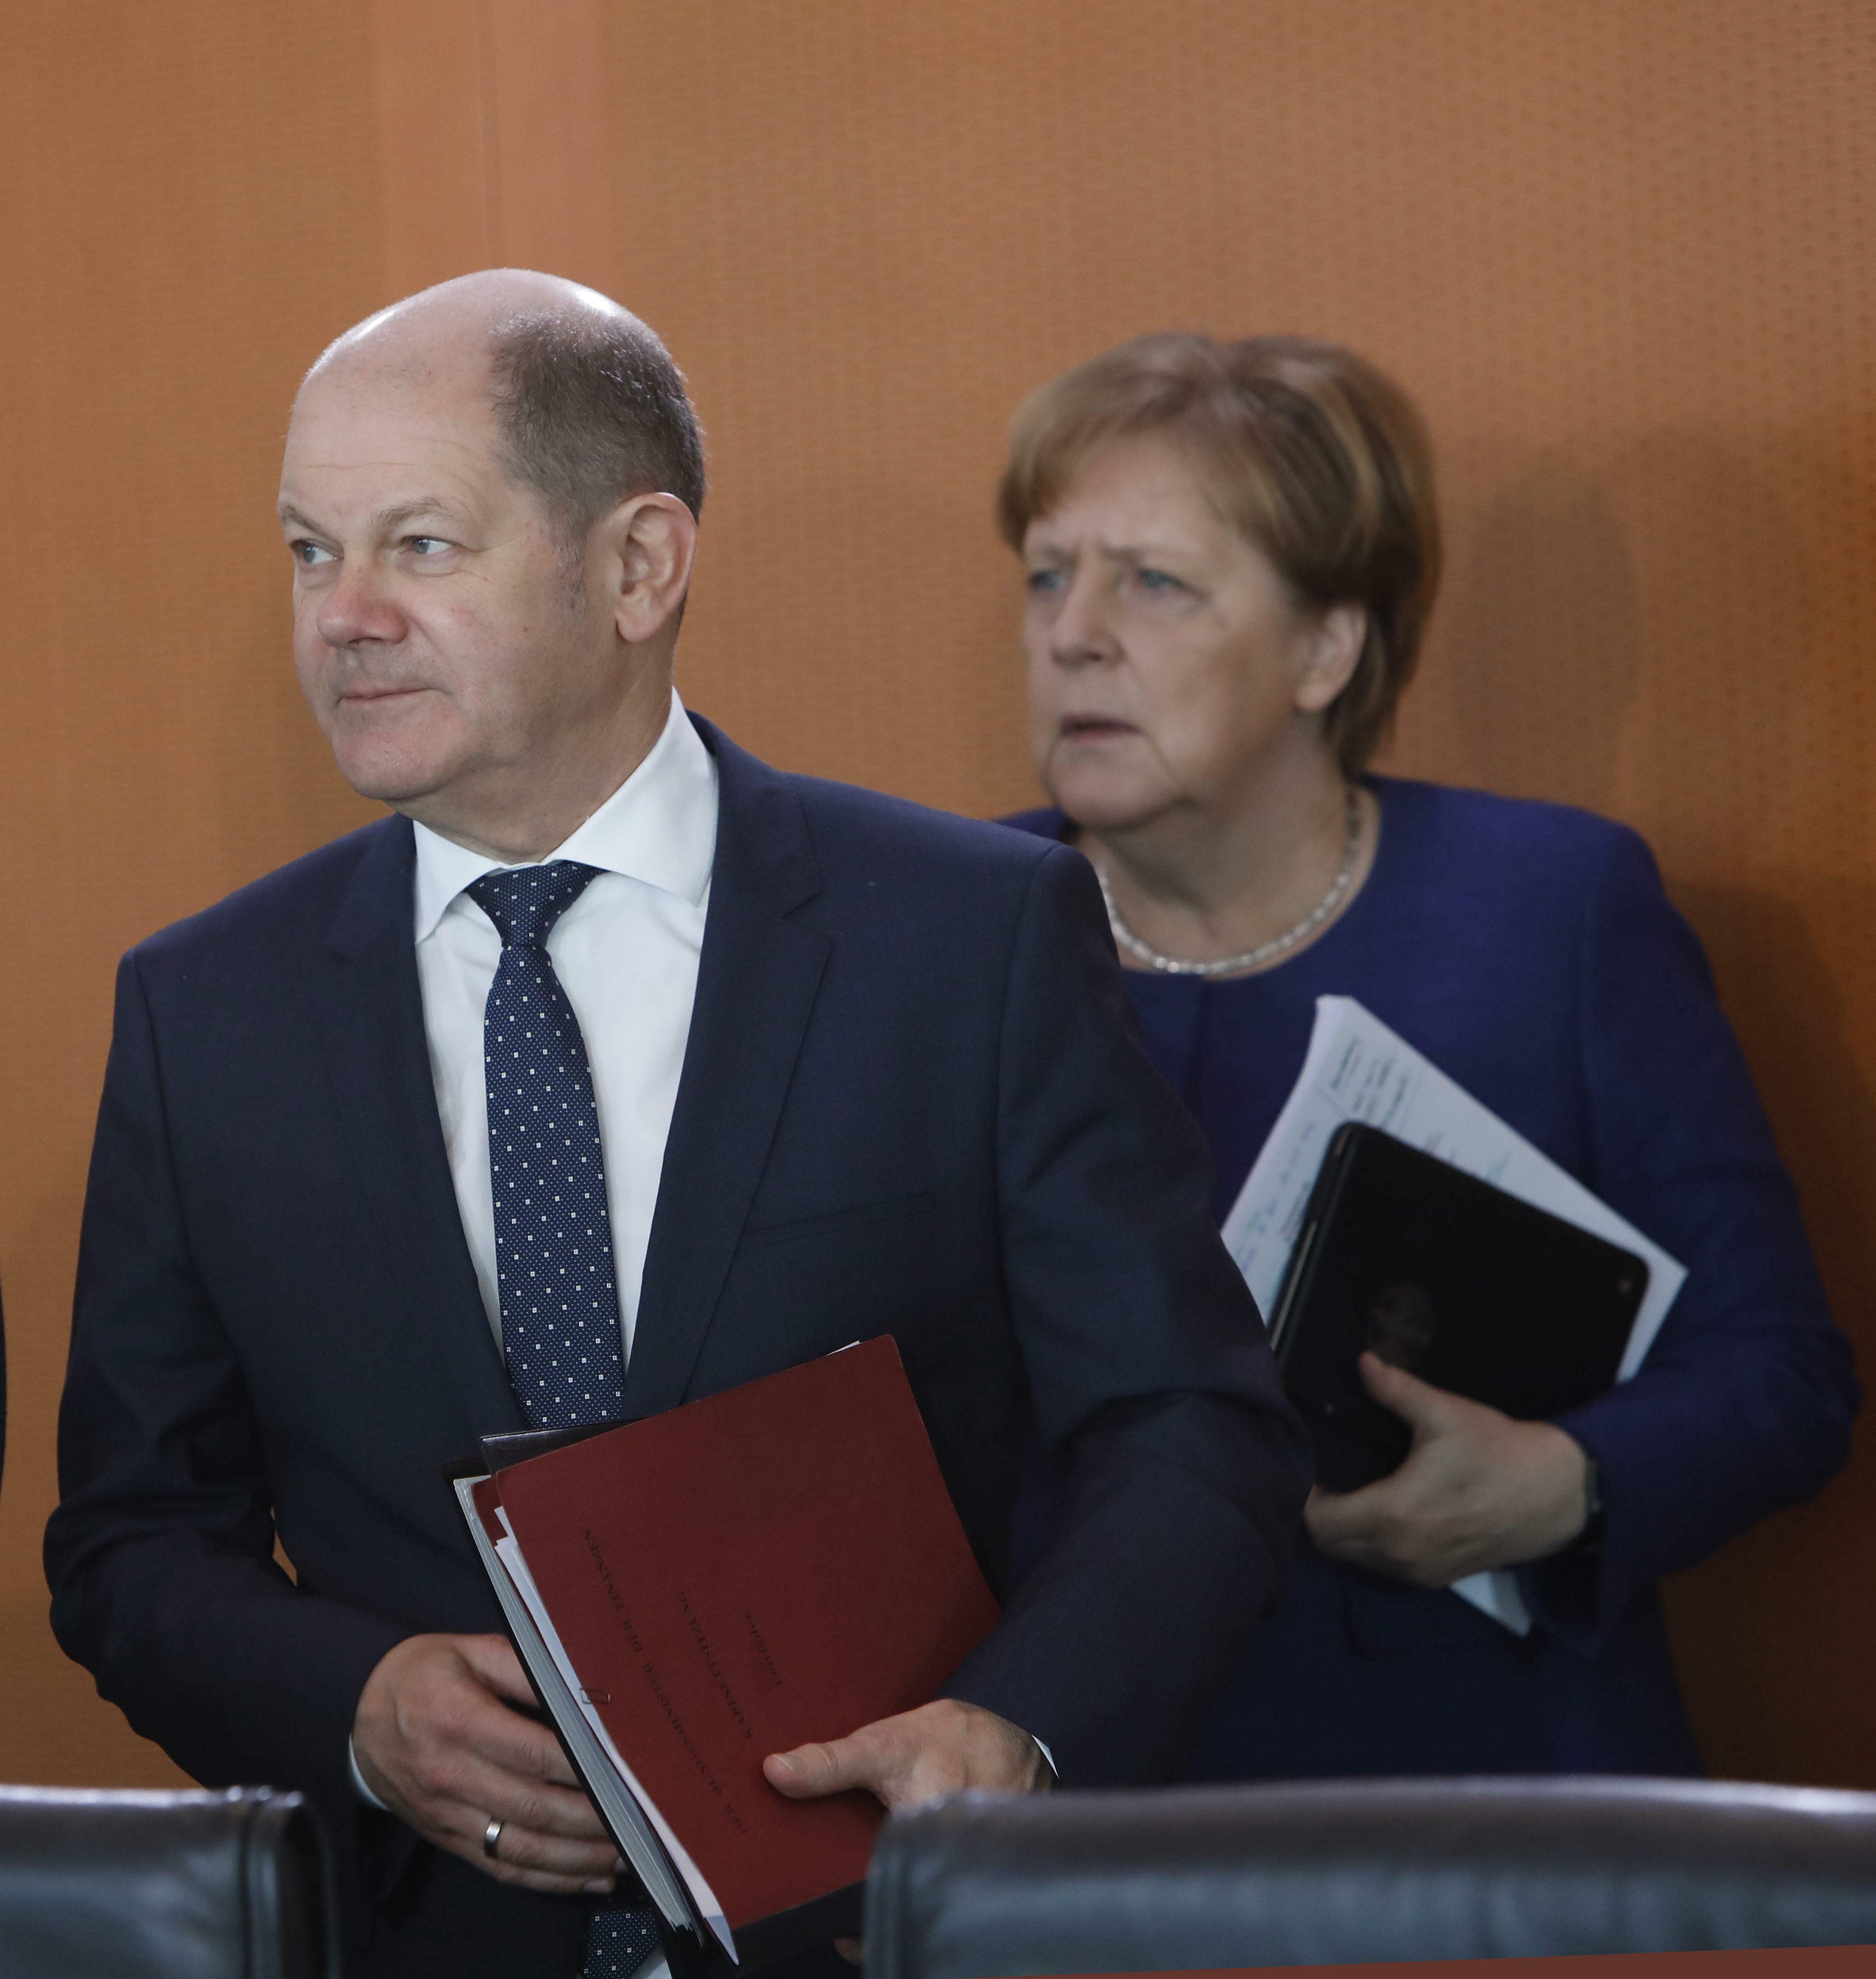 Grundrente: So sehen die Koalitionspartner den Kompromiss